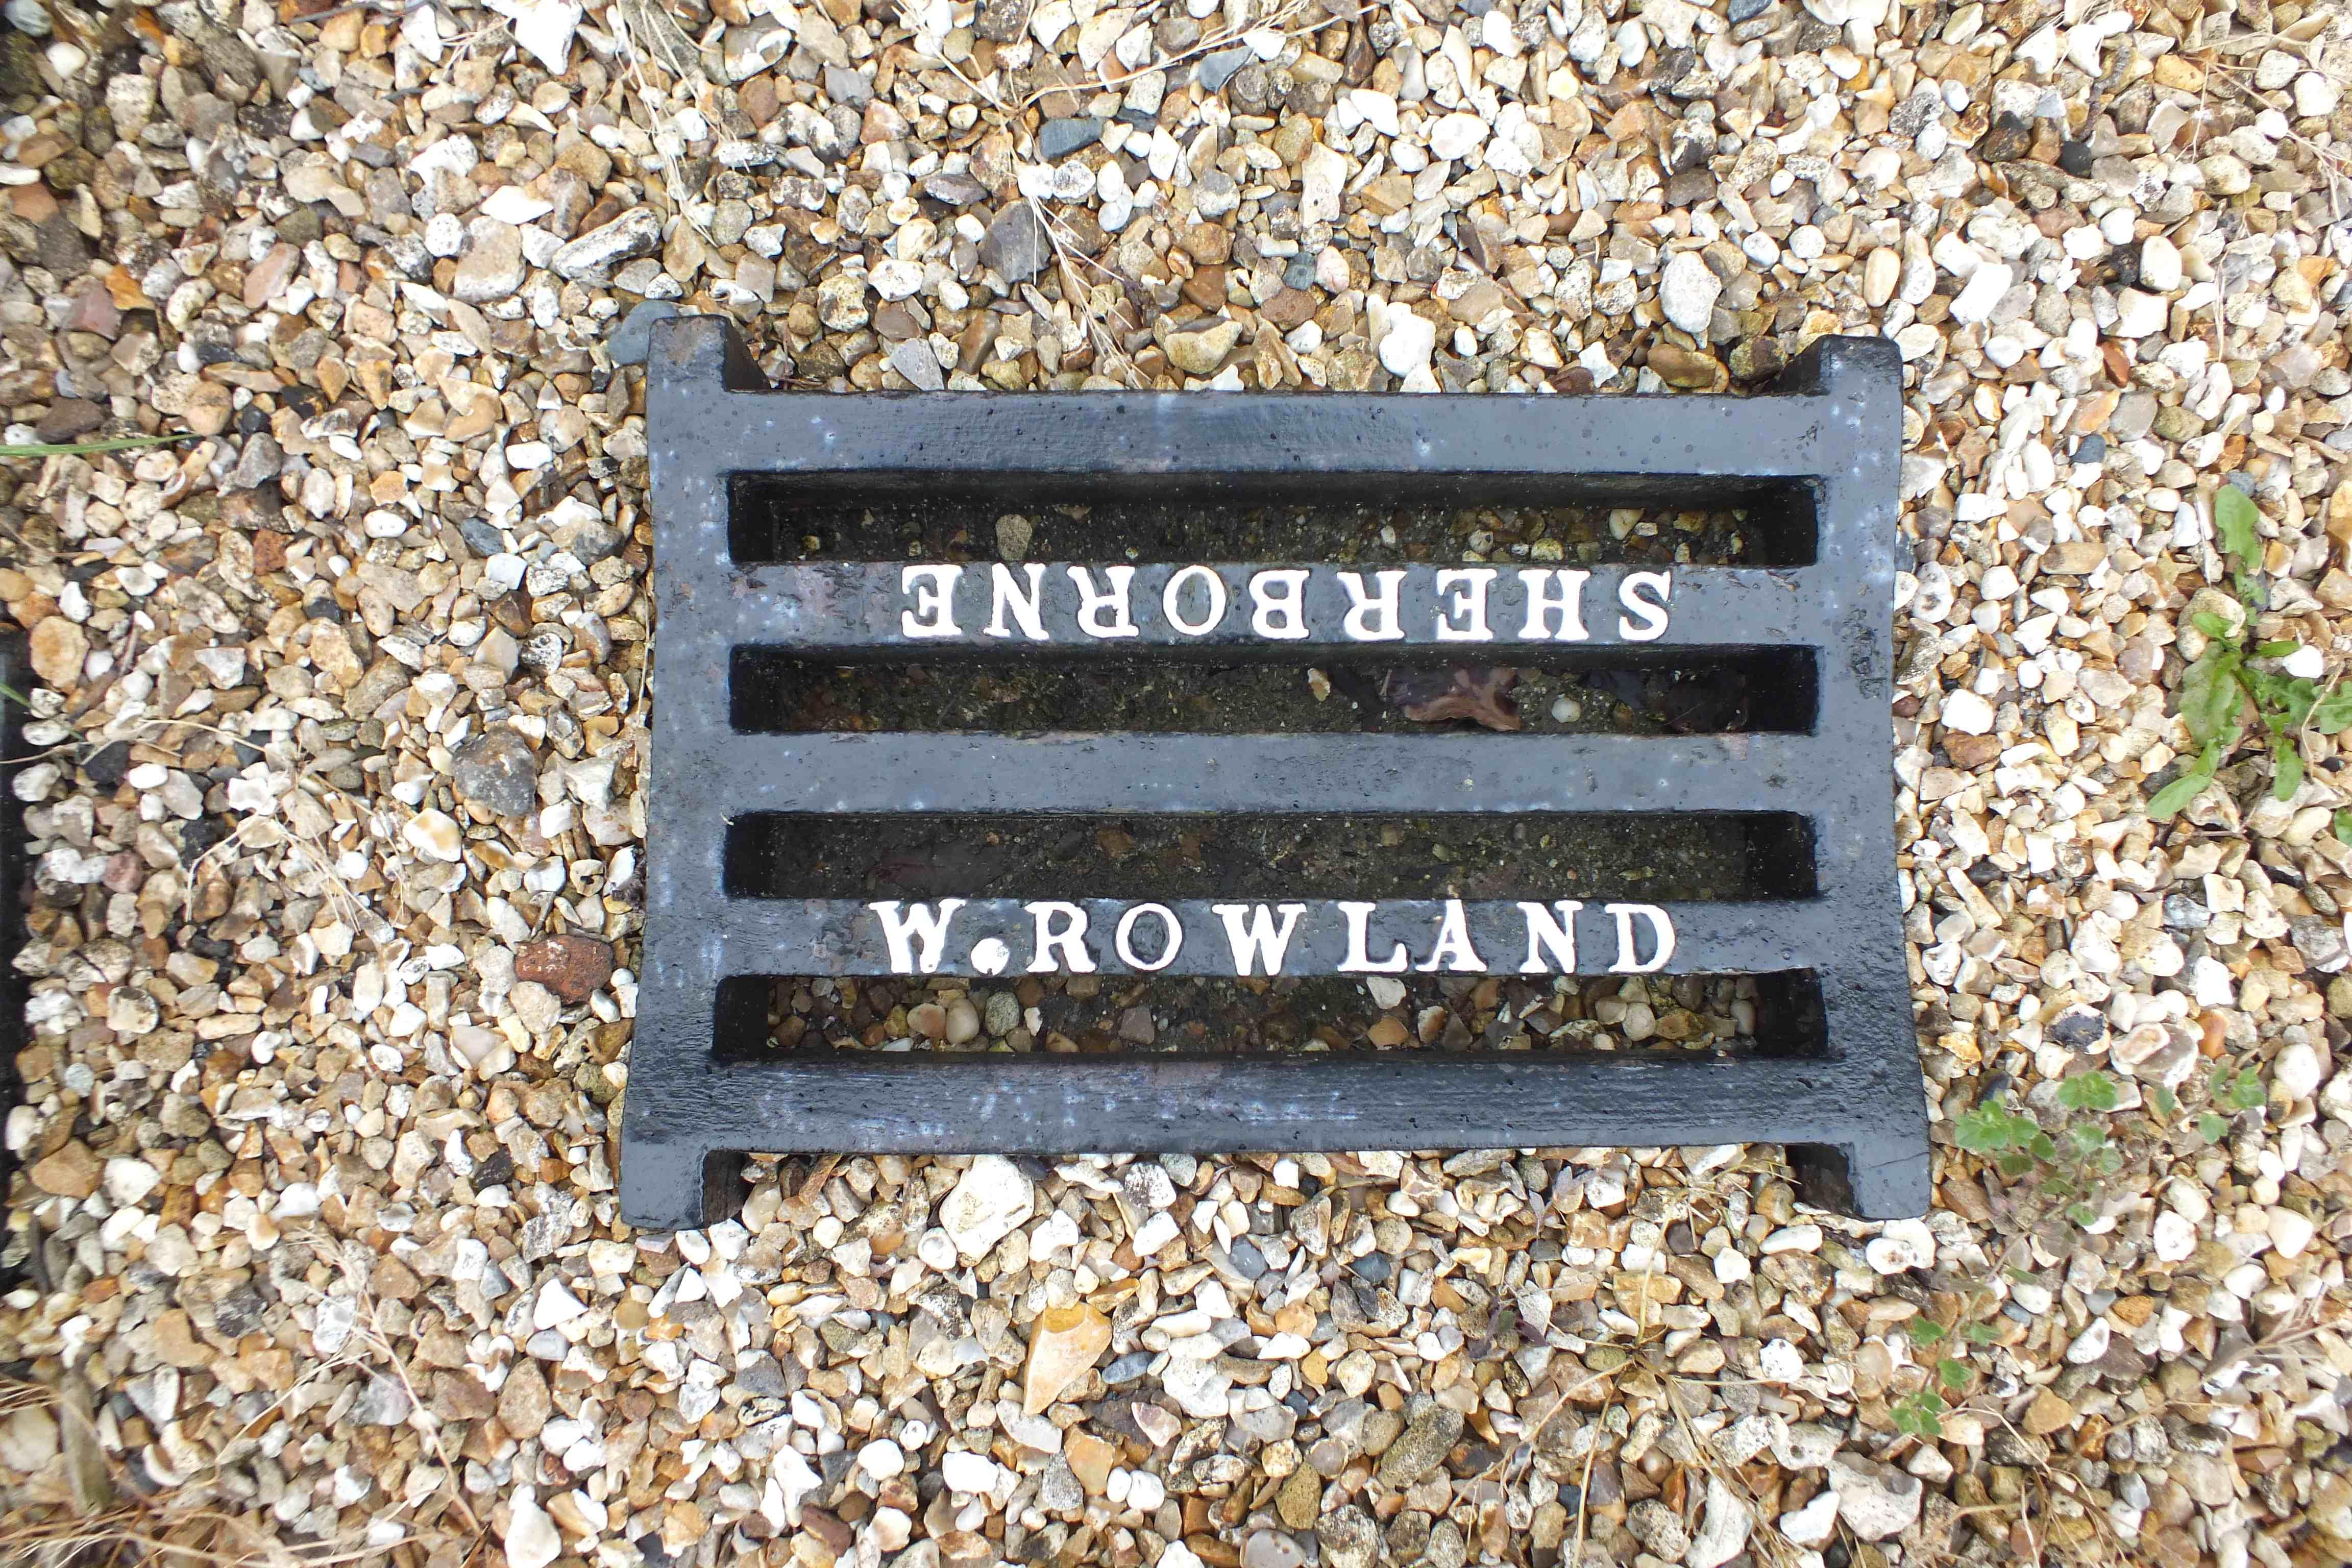 Rowland gratlng low